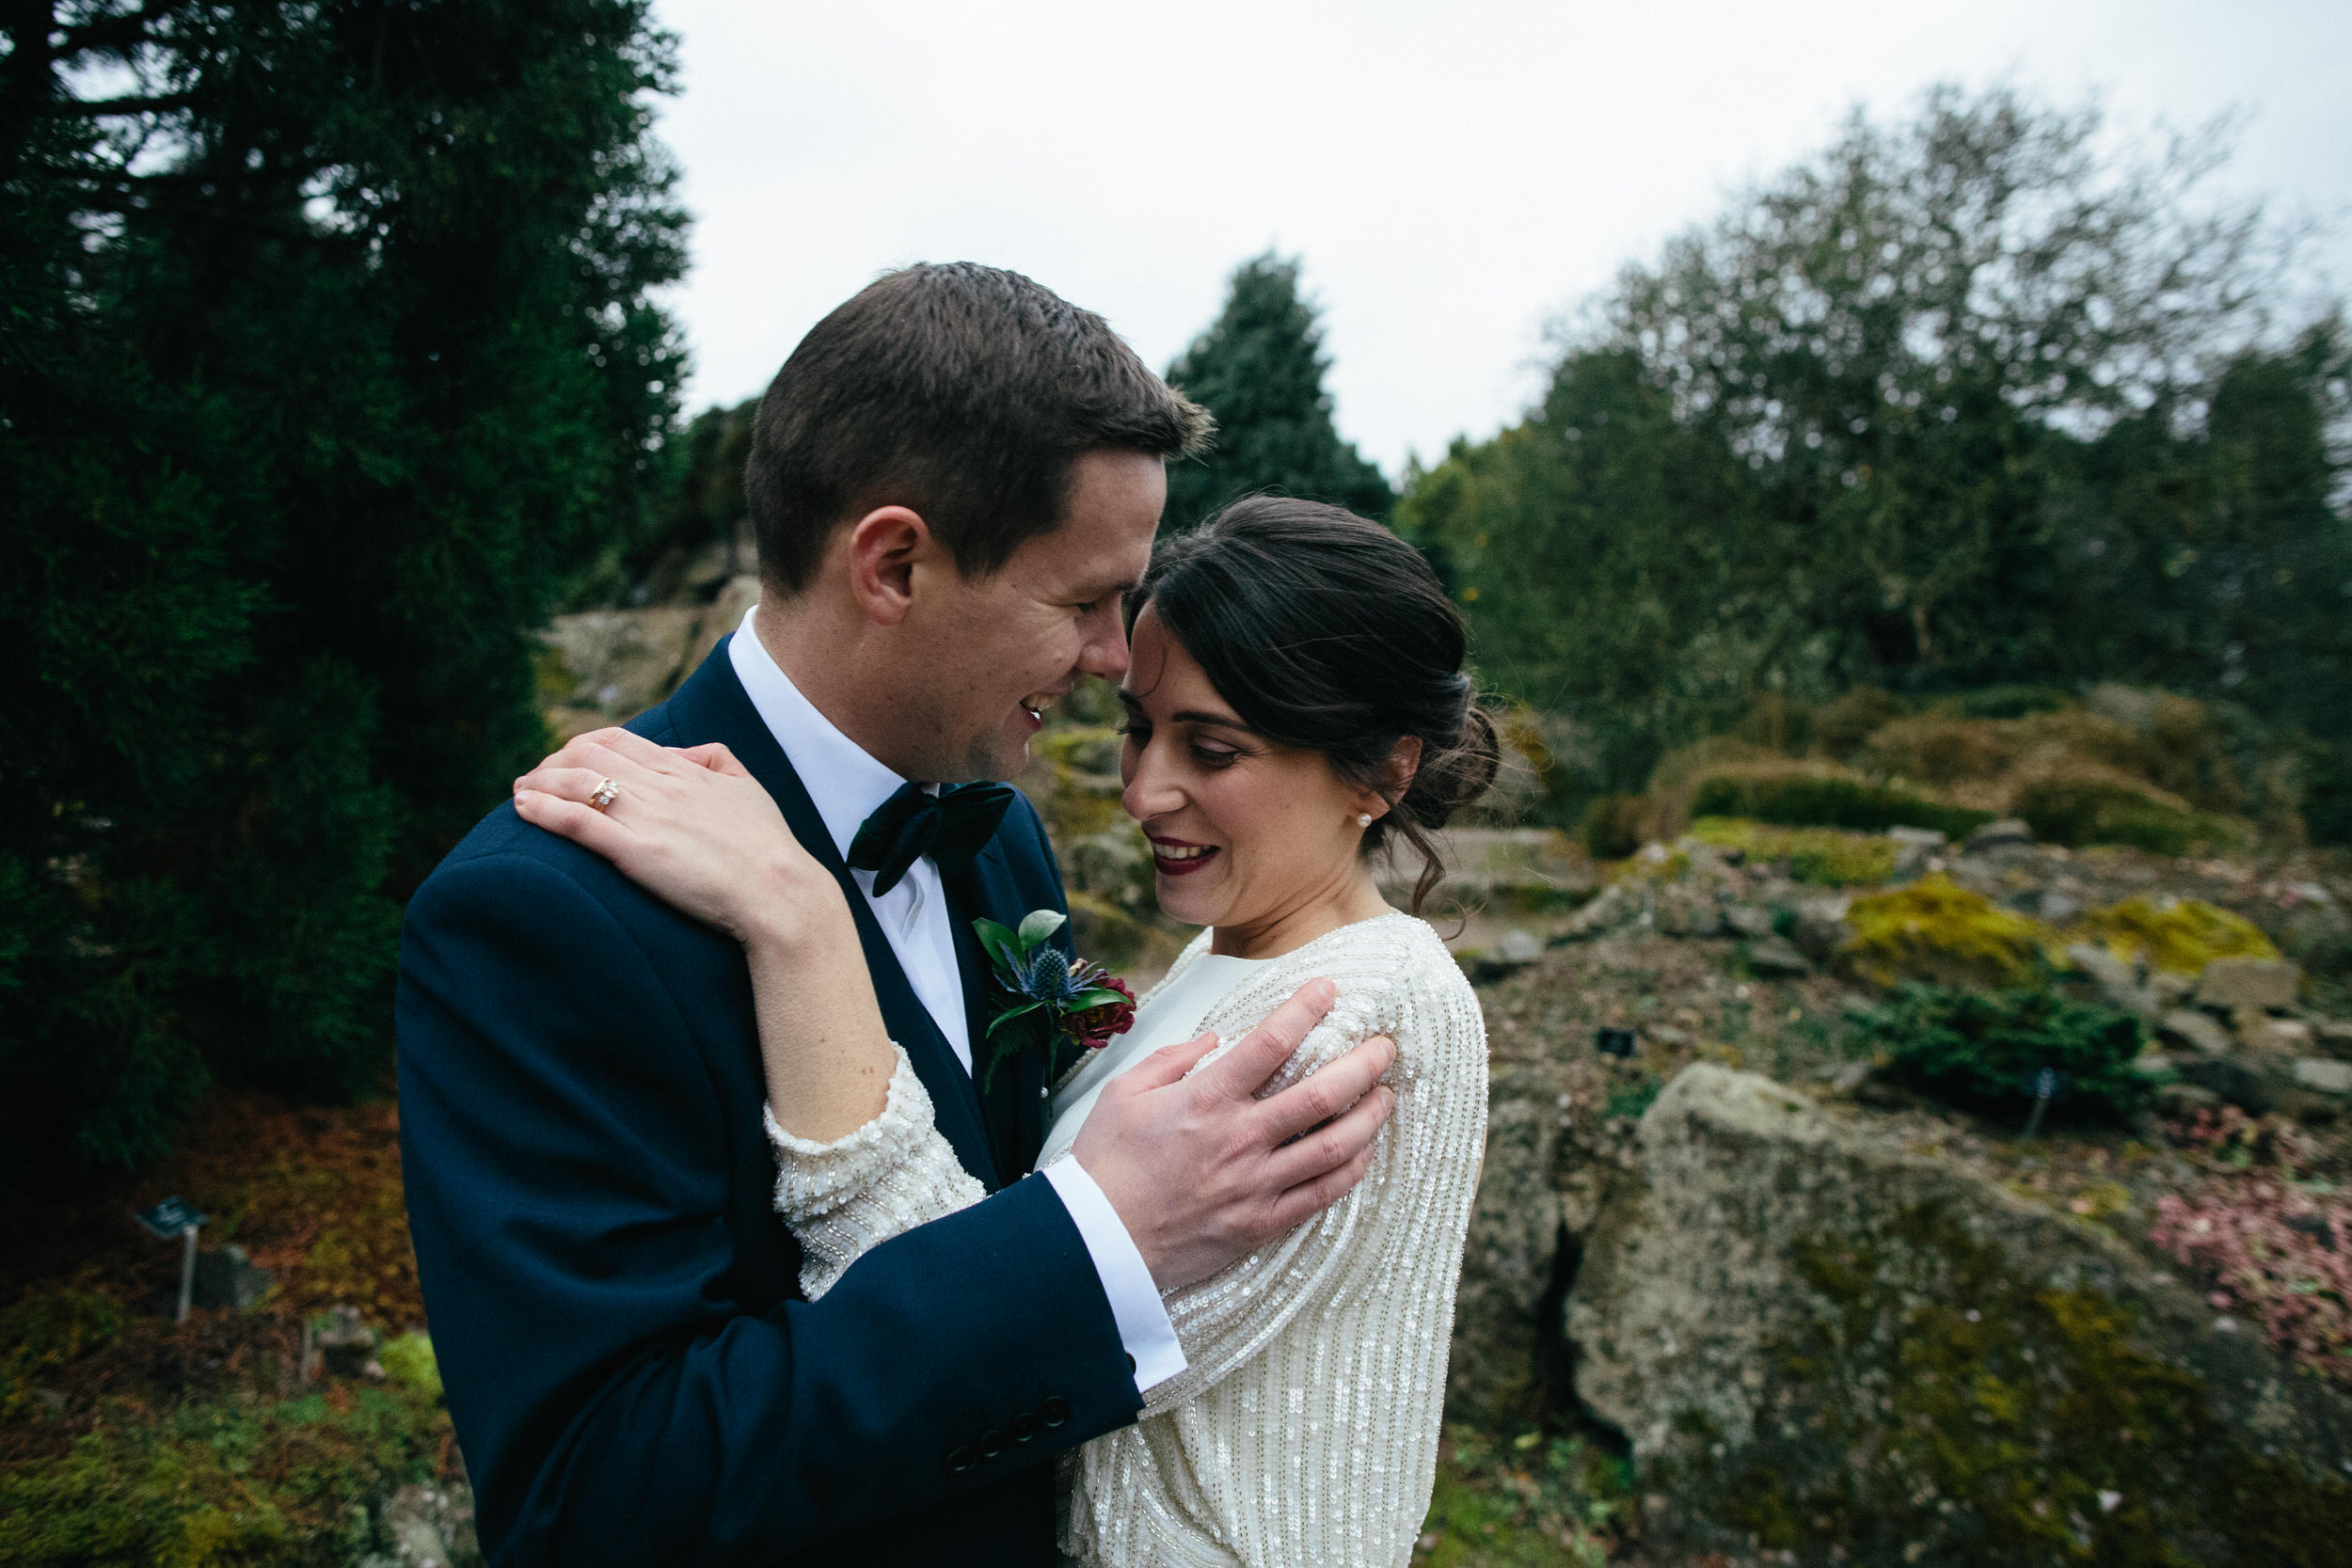 Quirky Wedding Photographer Scotland Glasgow Edinburgh Mirrorbox 134.jpg